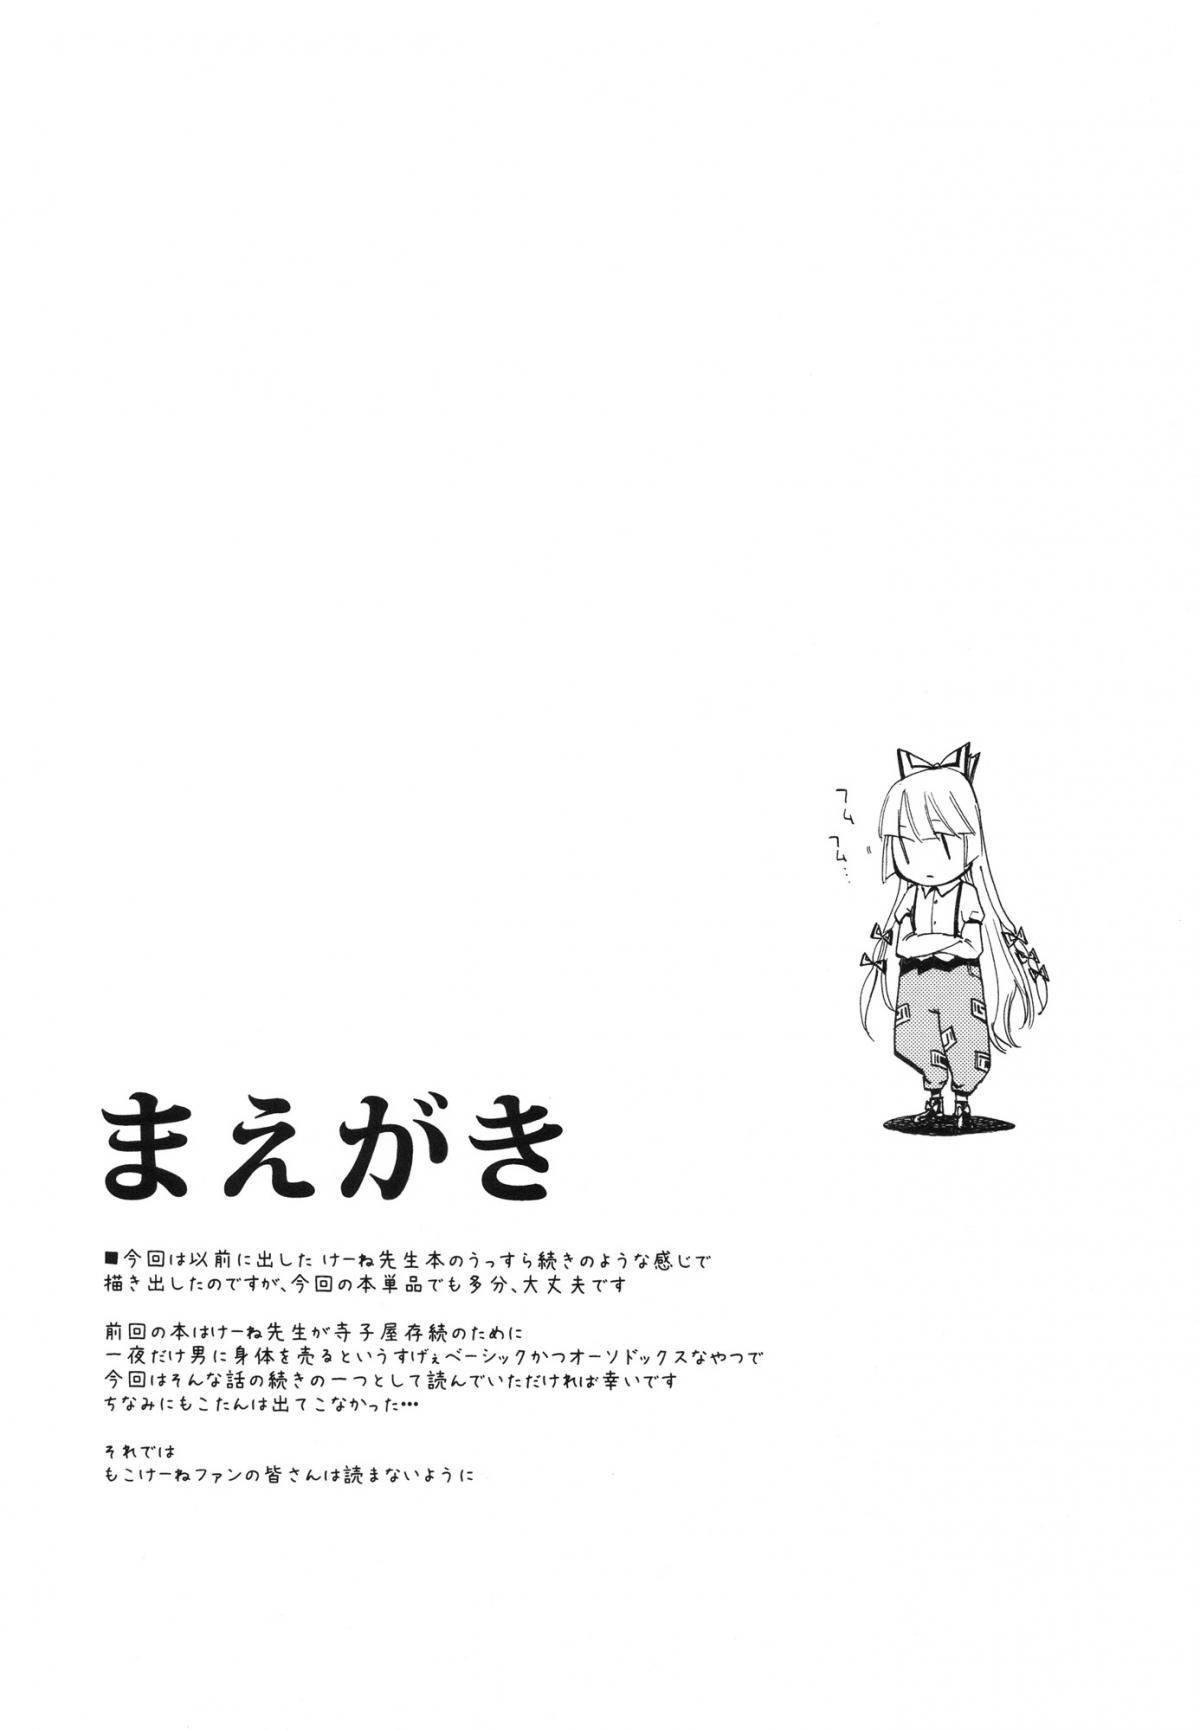 HentaiVN.net - Ảnh 3 - NTR crisis - Oneshot